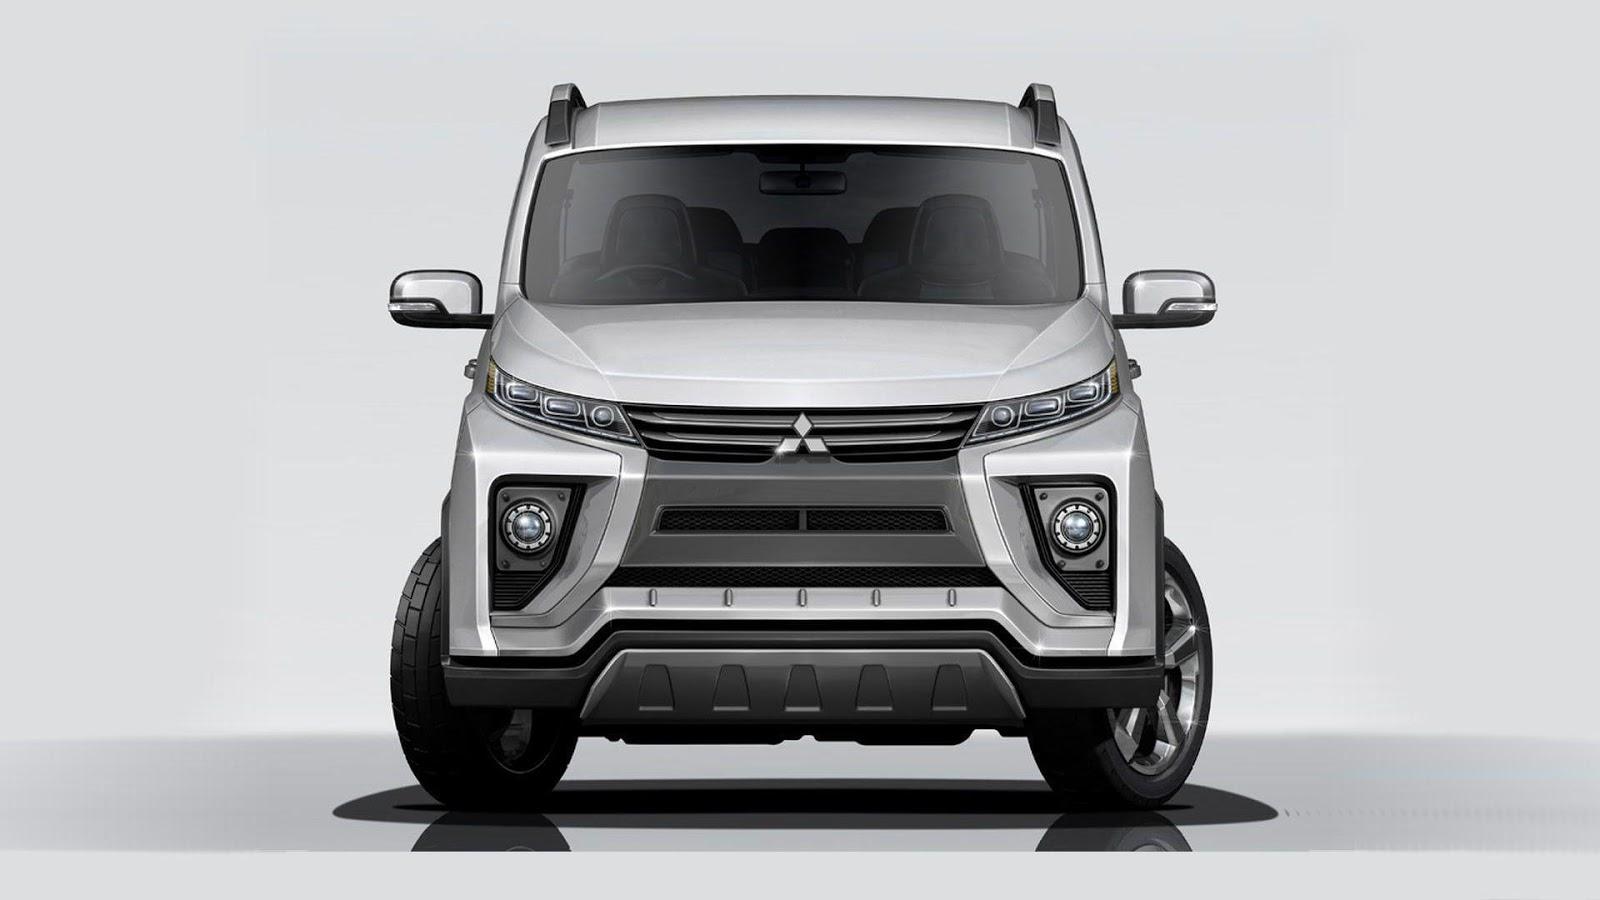 New Mitsubishi Delica Concept Leaks Before Tokyo Motor Show